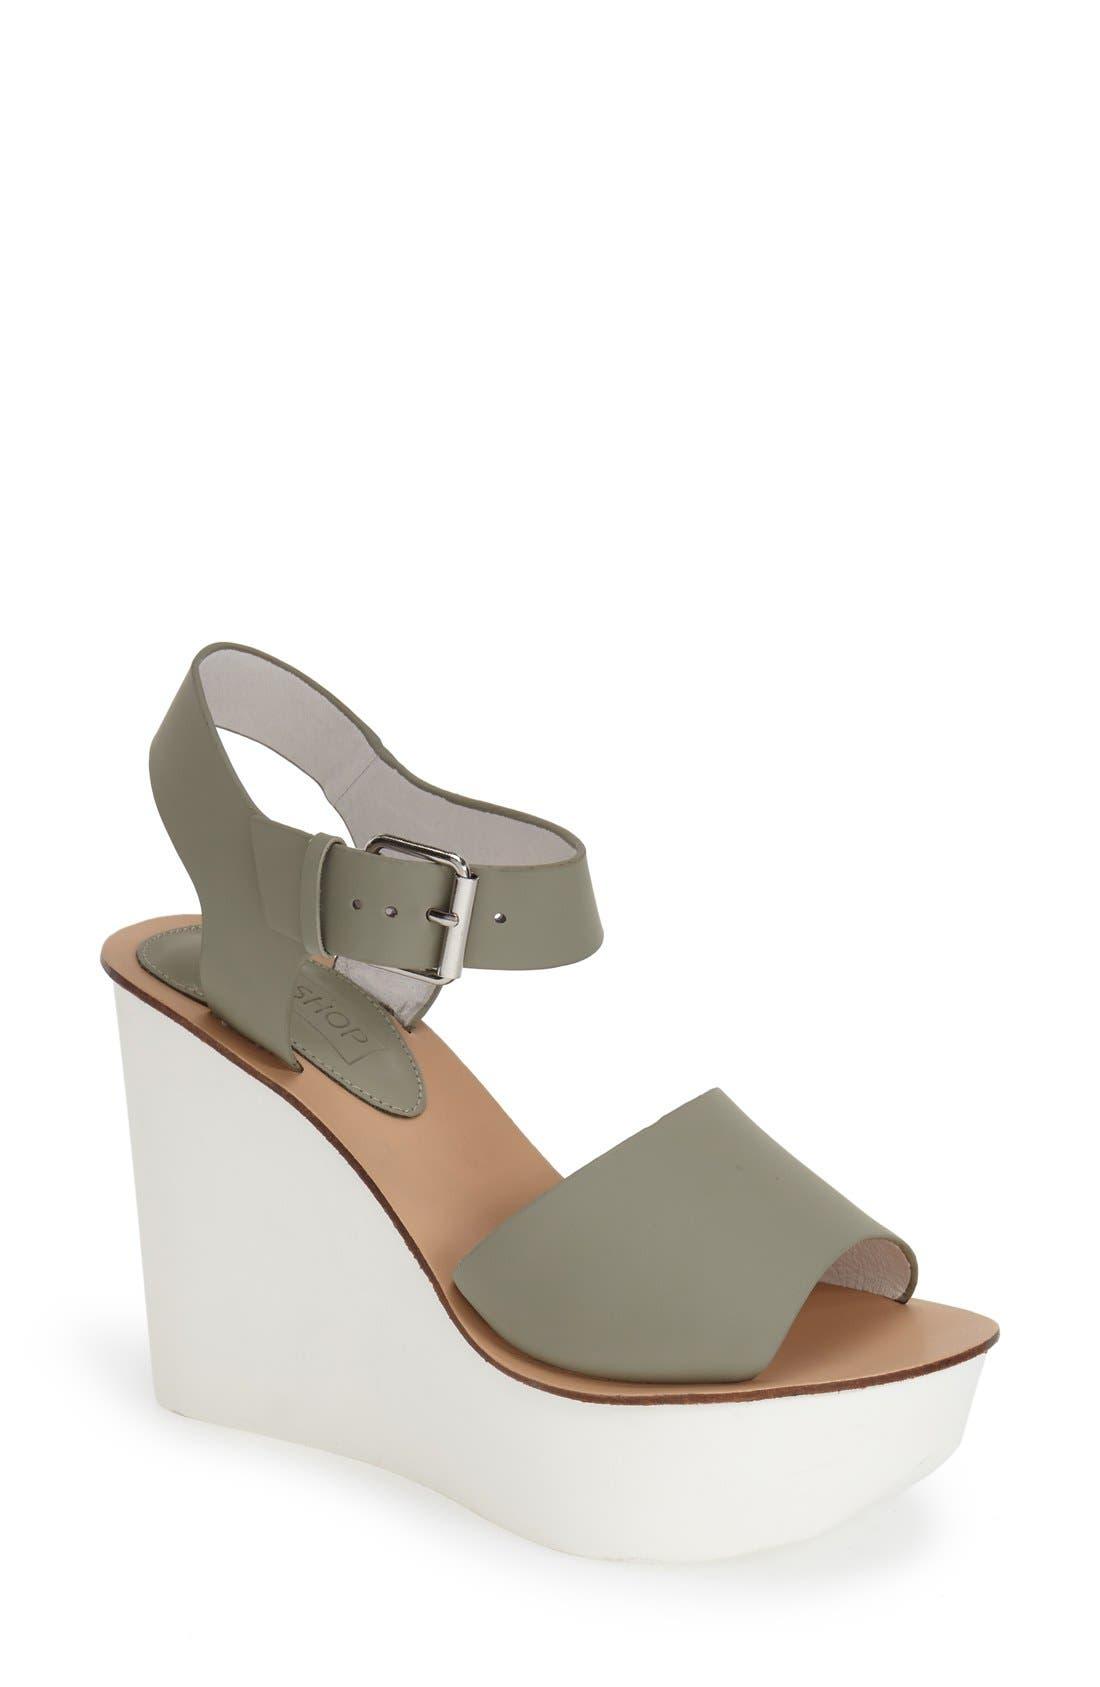 Alternate Image 1 Selected - Topshop Platform Wedge Sandal (Women)